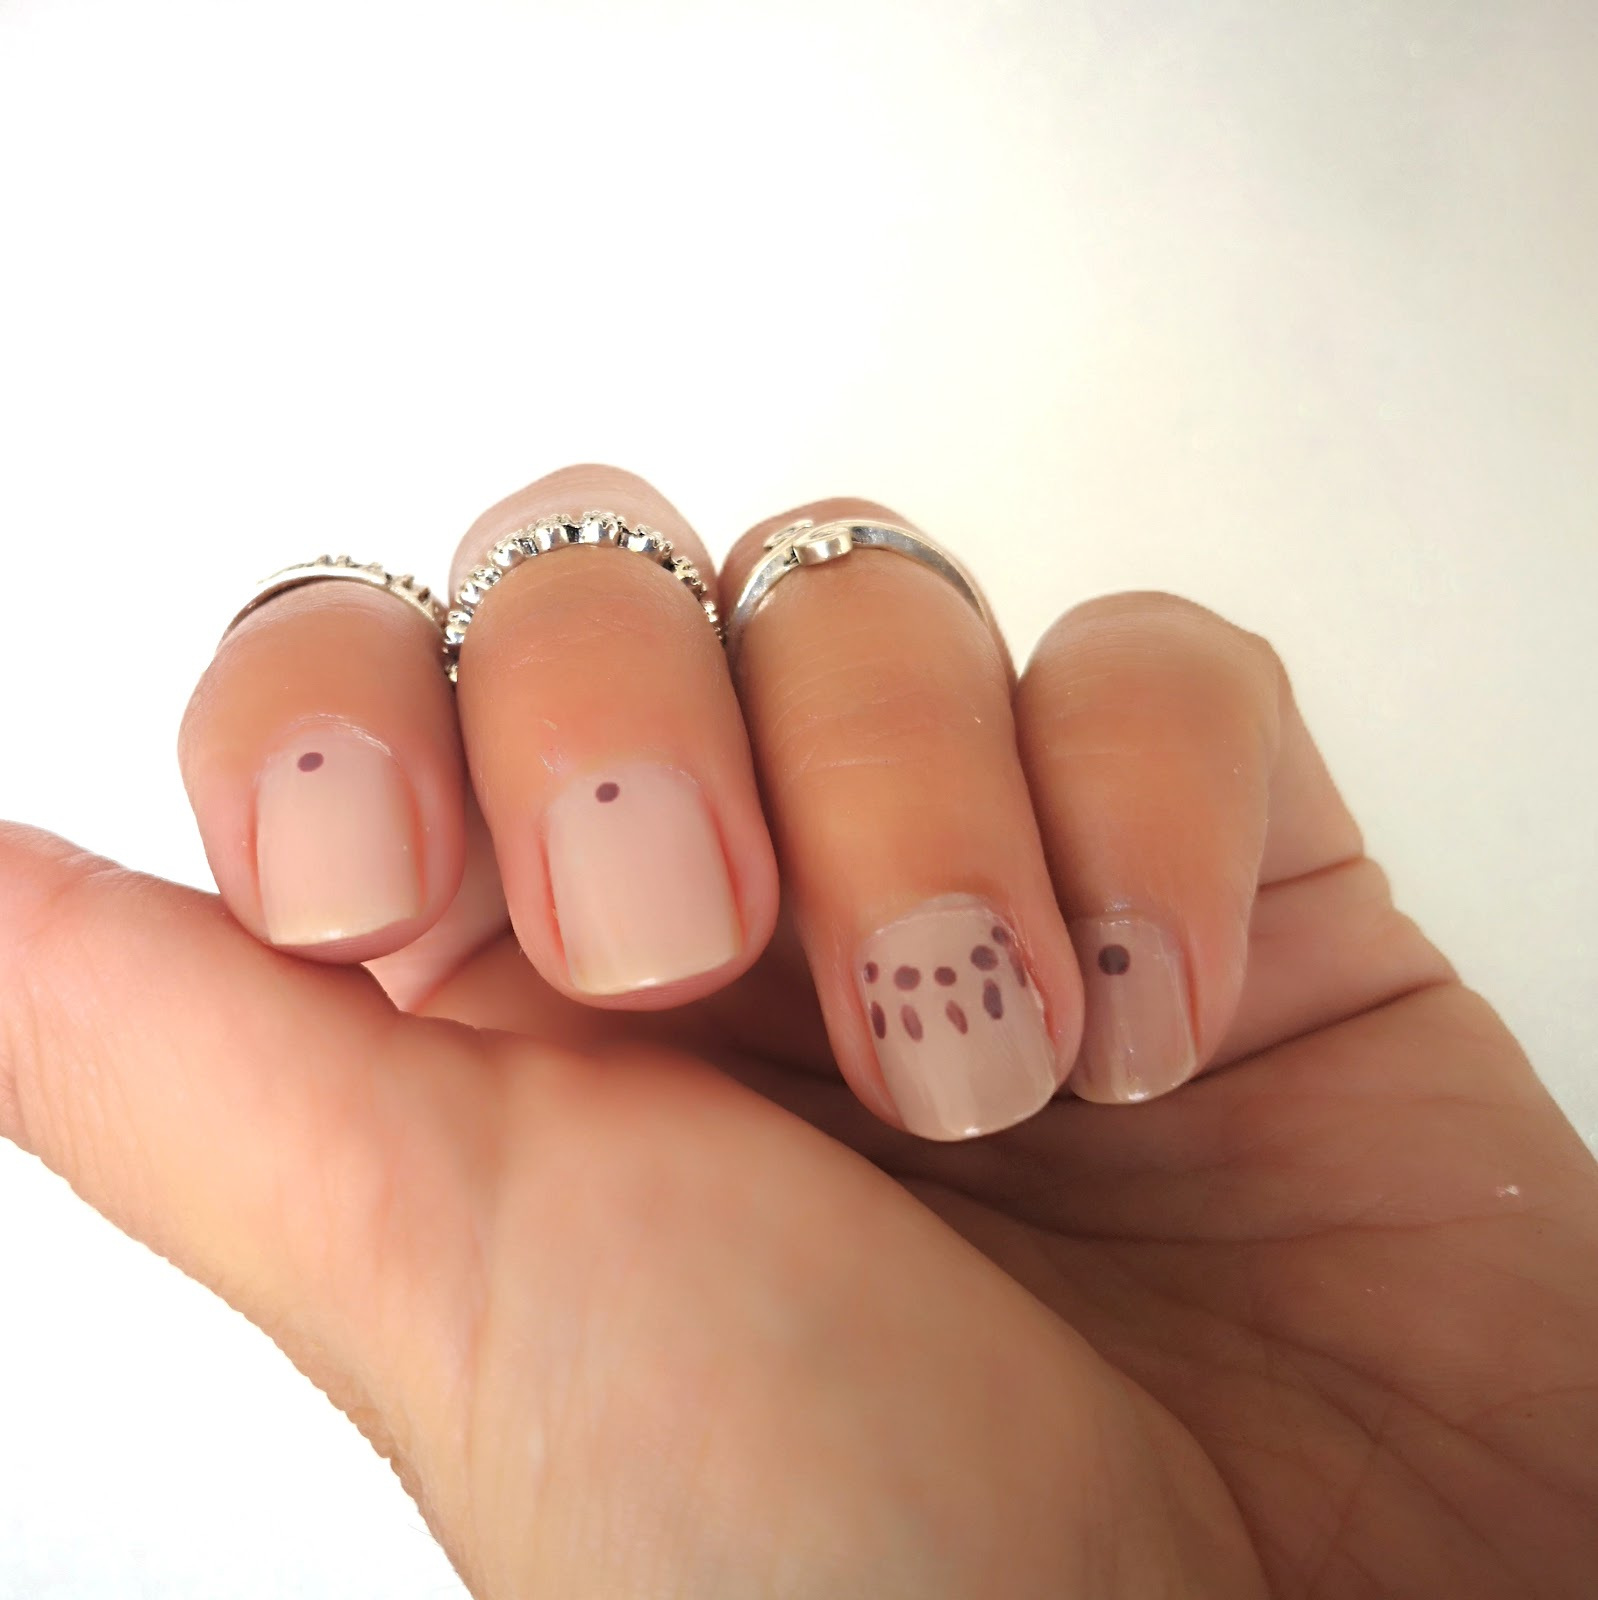 cfbea0ccd9 Cinco ideas para tus manicuras de otoño  ¡Inspírate!